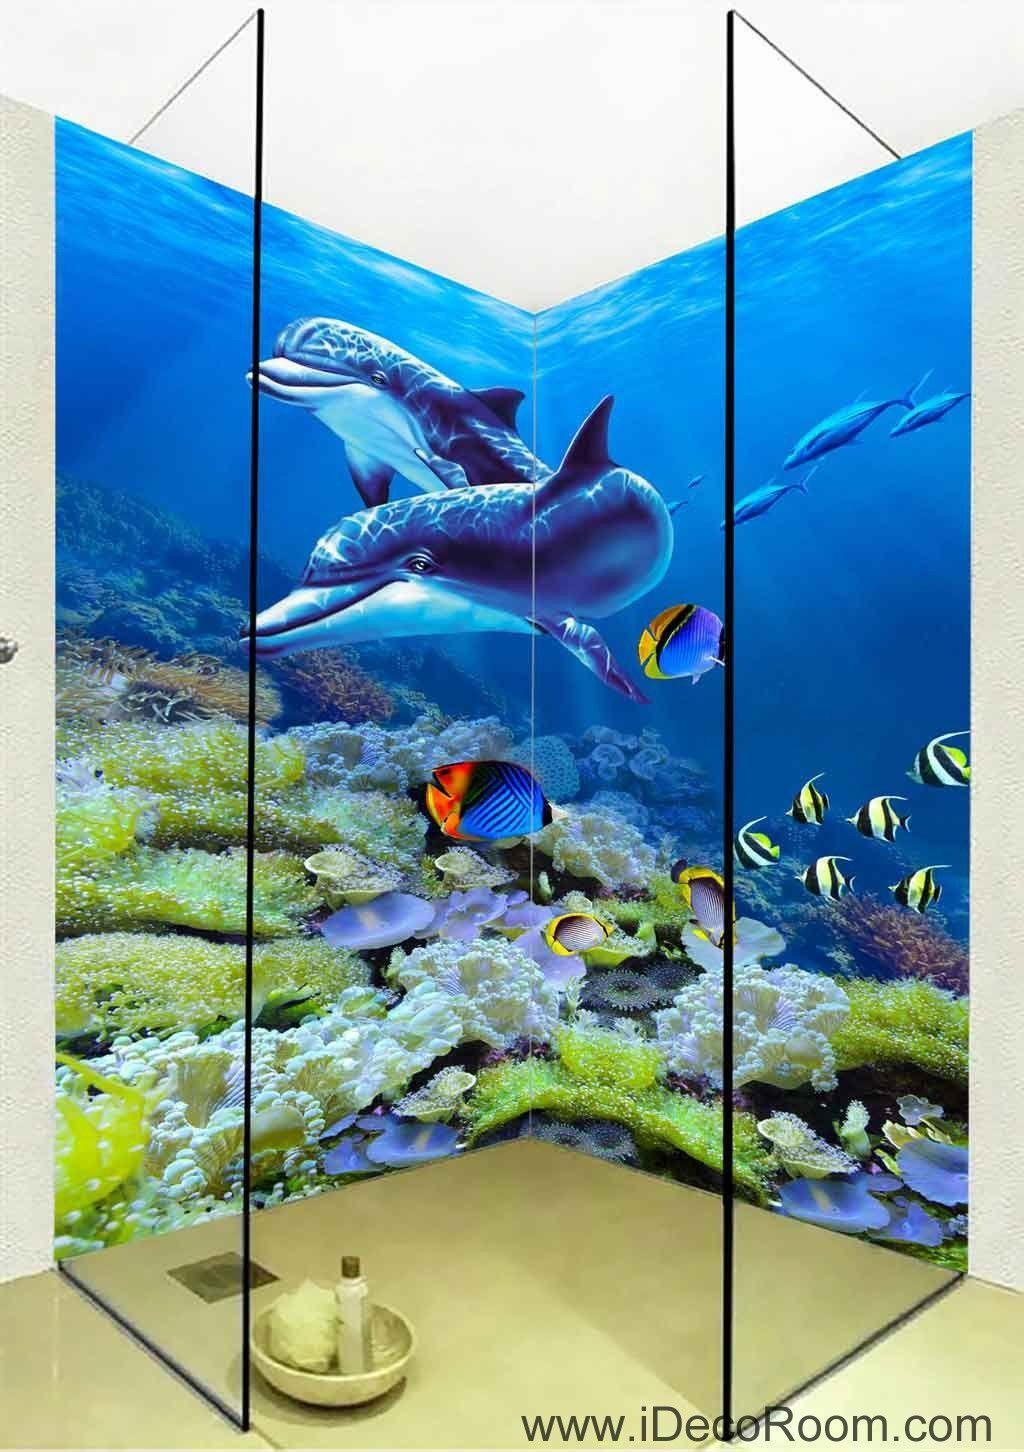 3d Wallpaper Dophins Coral Fish Wall Murals Bathroom Decals Wall Art Print Home Office Decor Bathroom Wall Mural Decal Wall Art Wall Murals